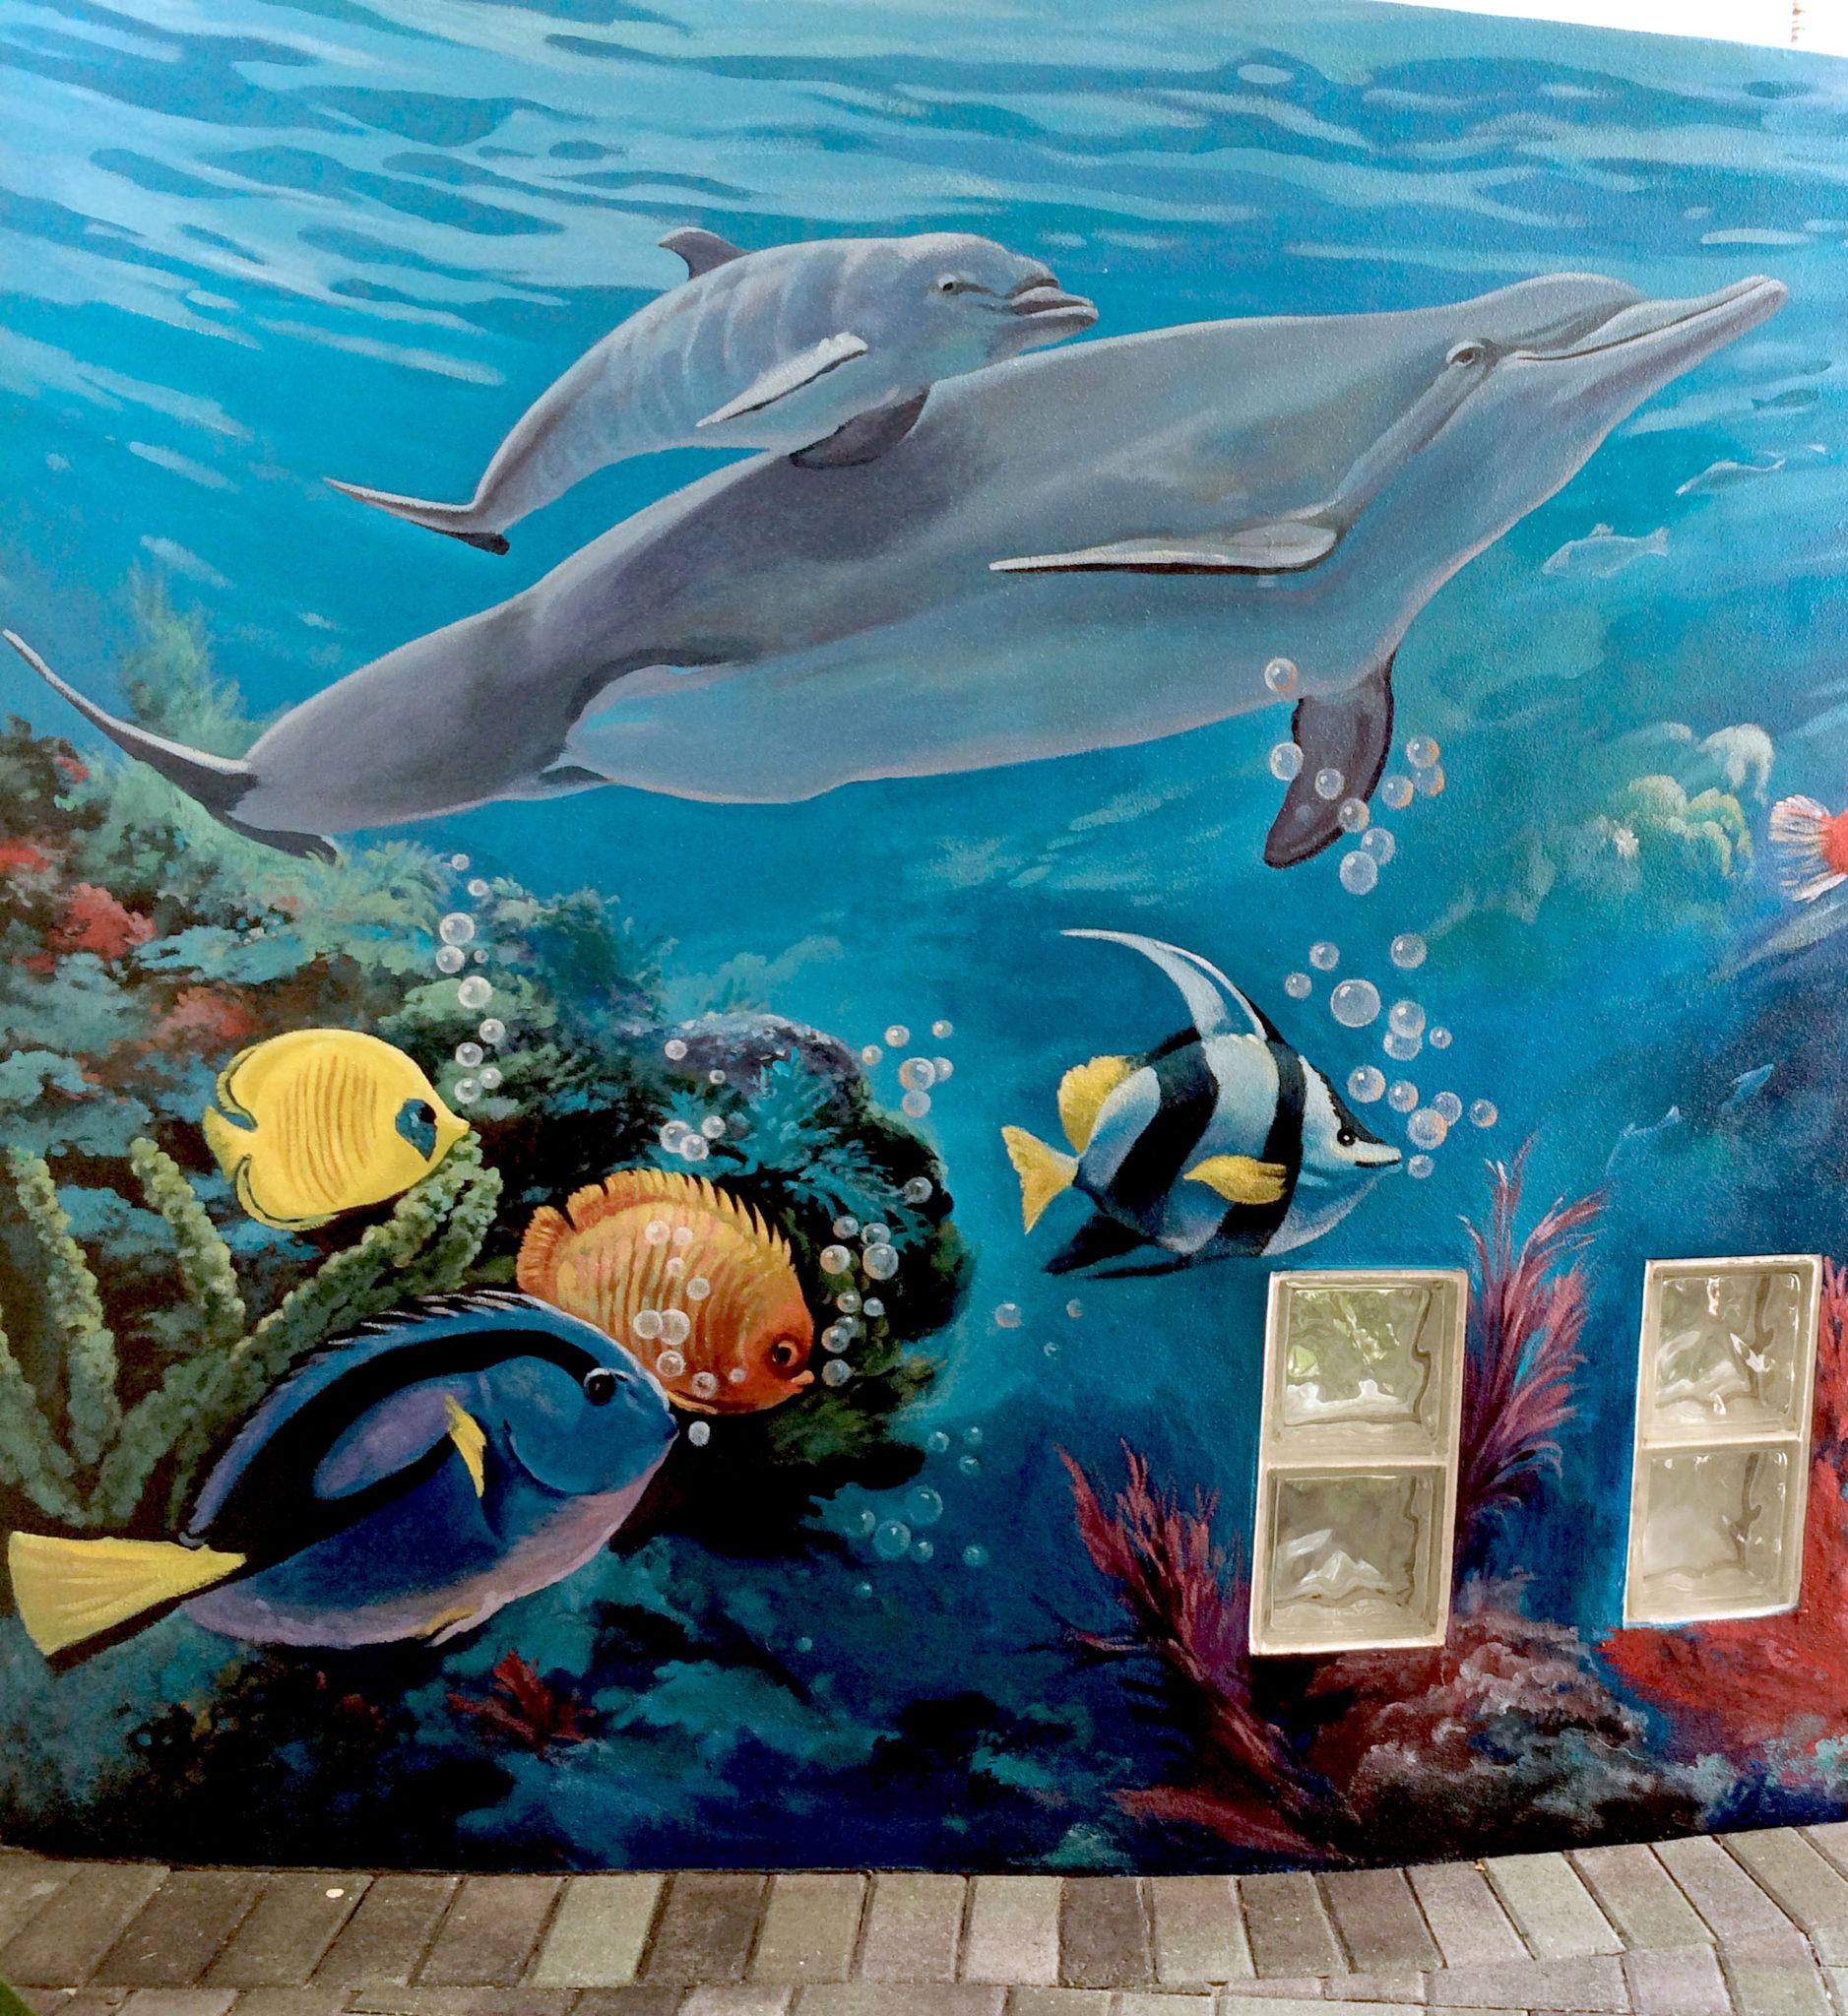 Sea mural 3 underwater mural broward medical center for Commercial mural